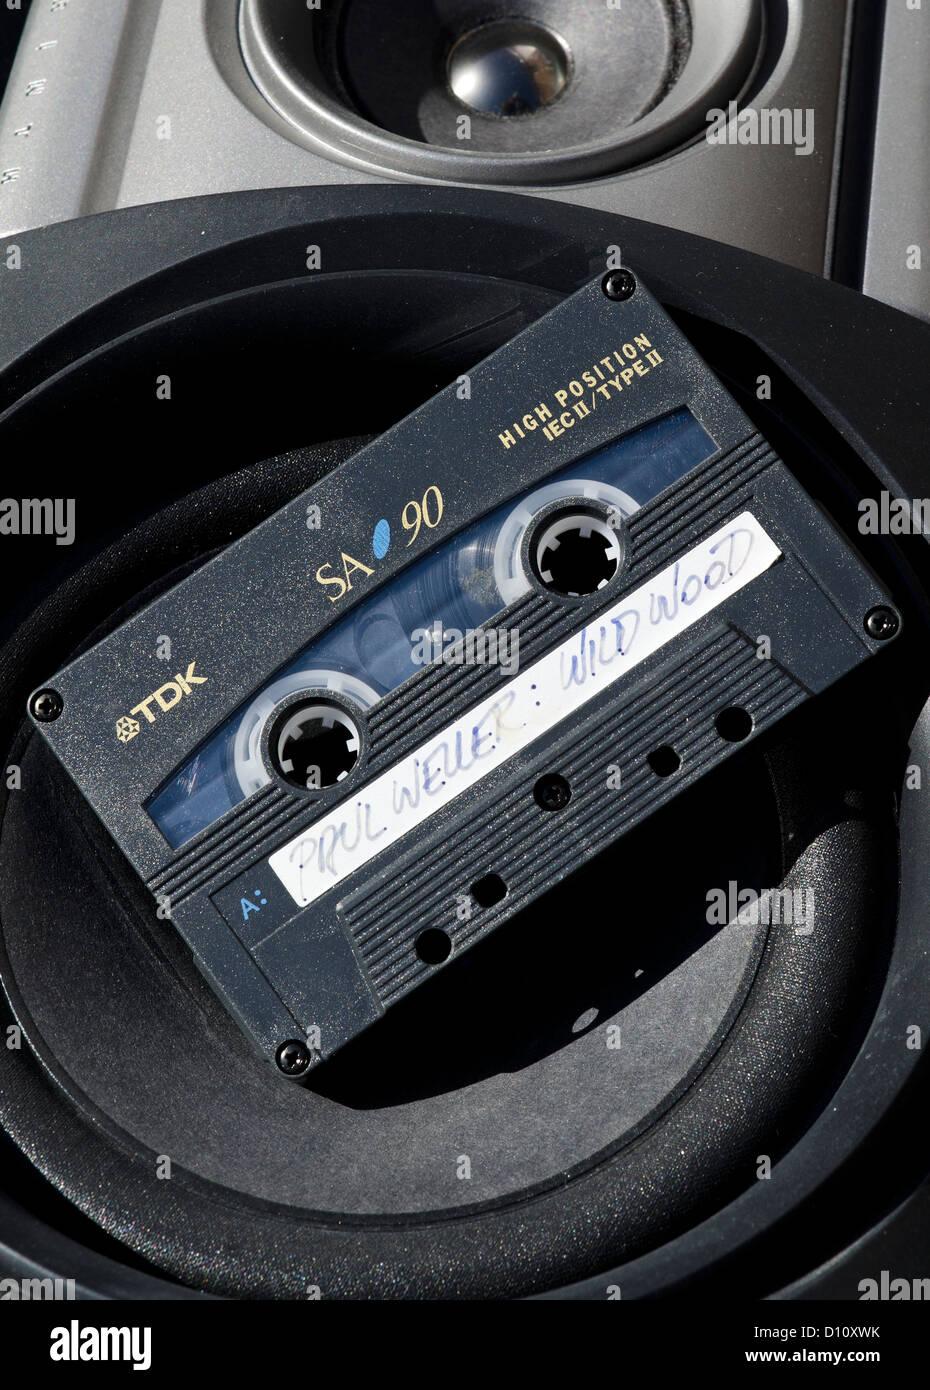 Audio Cassette Tape of Paul Weller, Wild Wood Album. - Stock Image